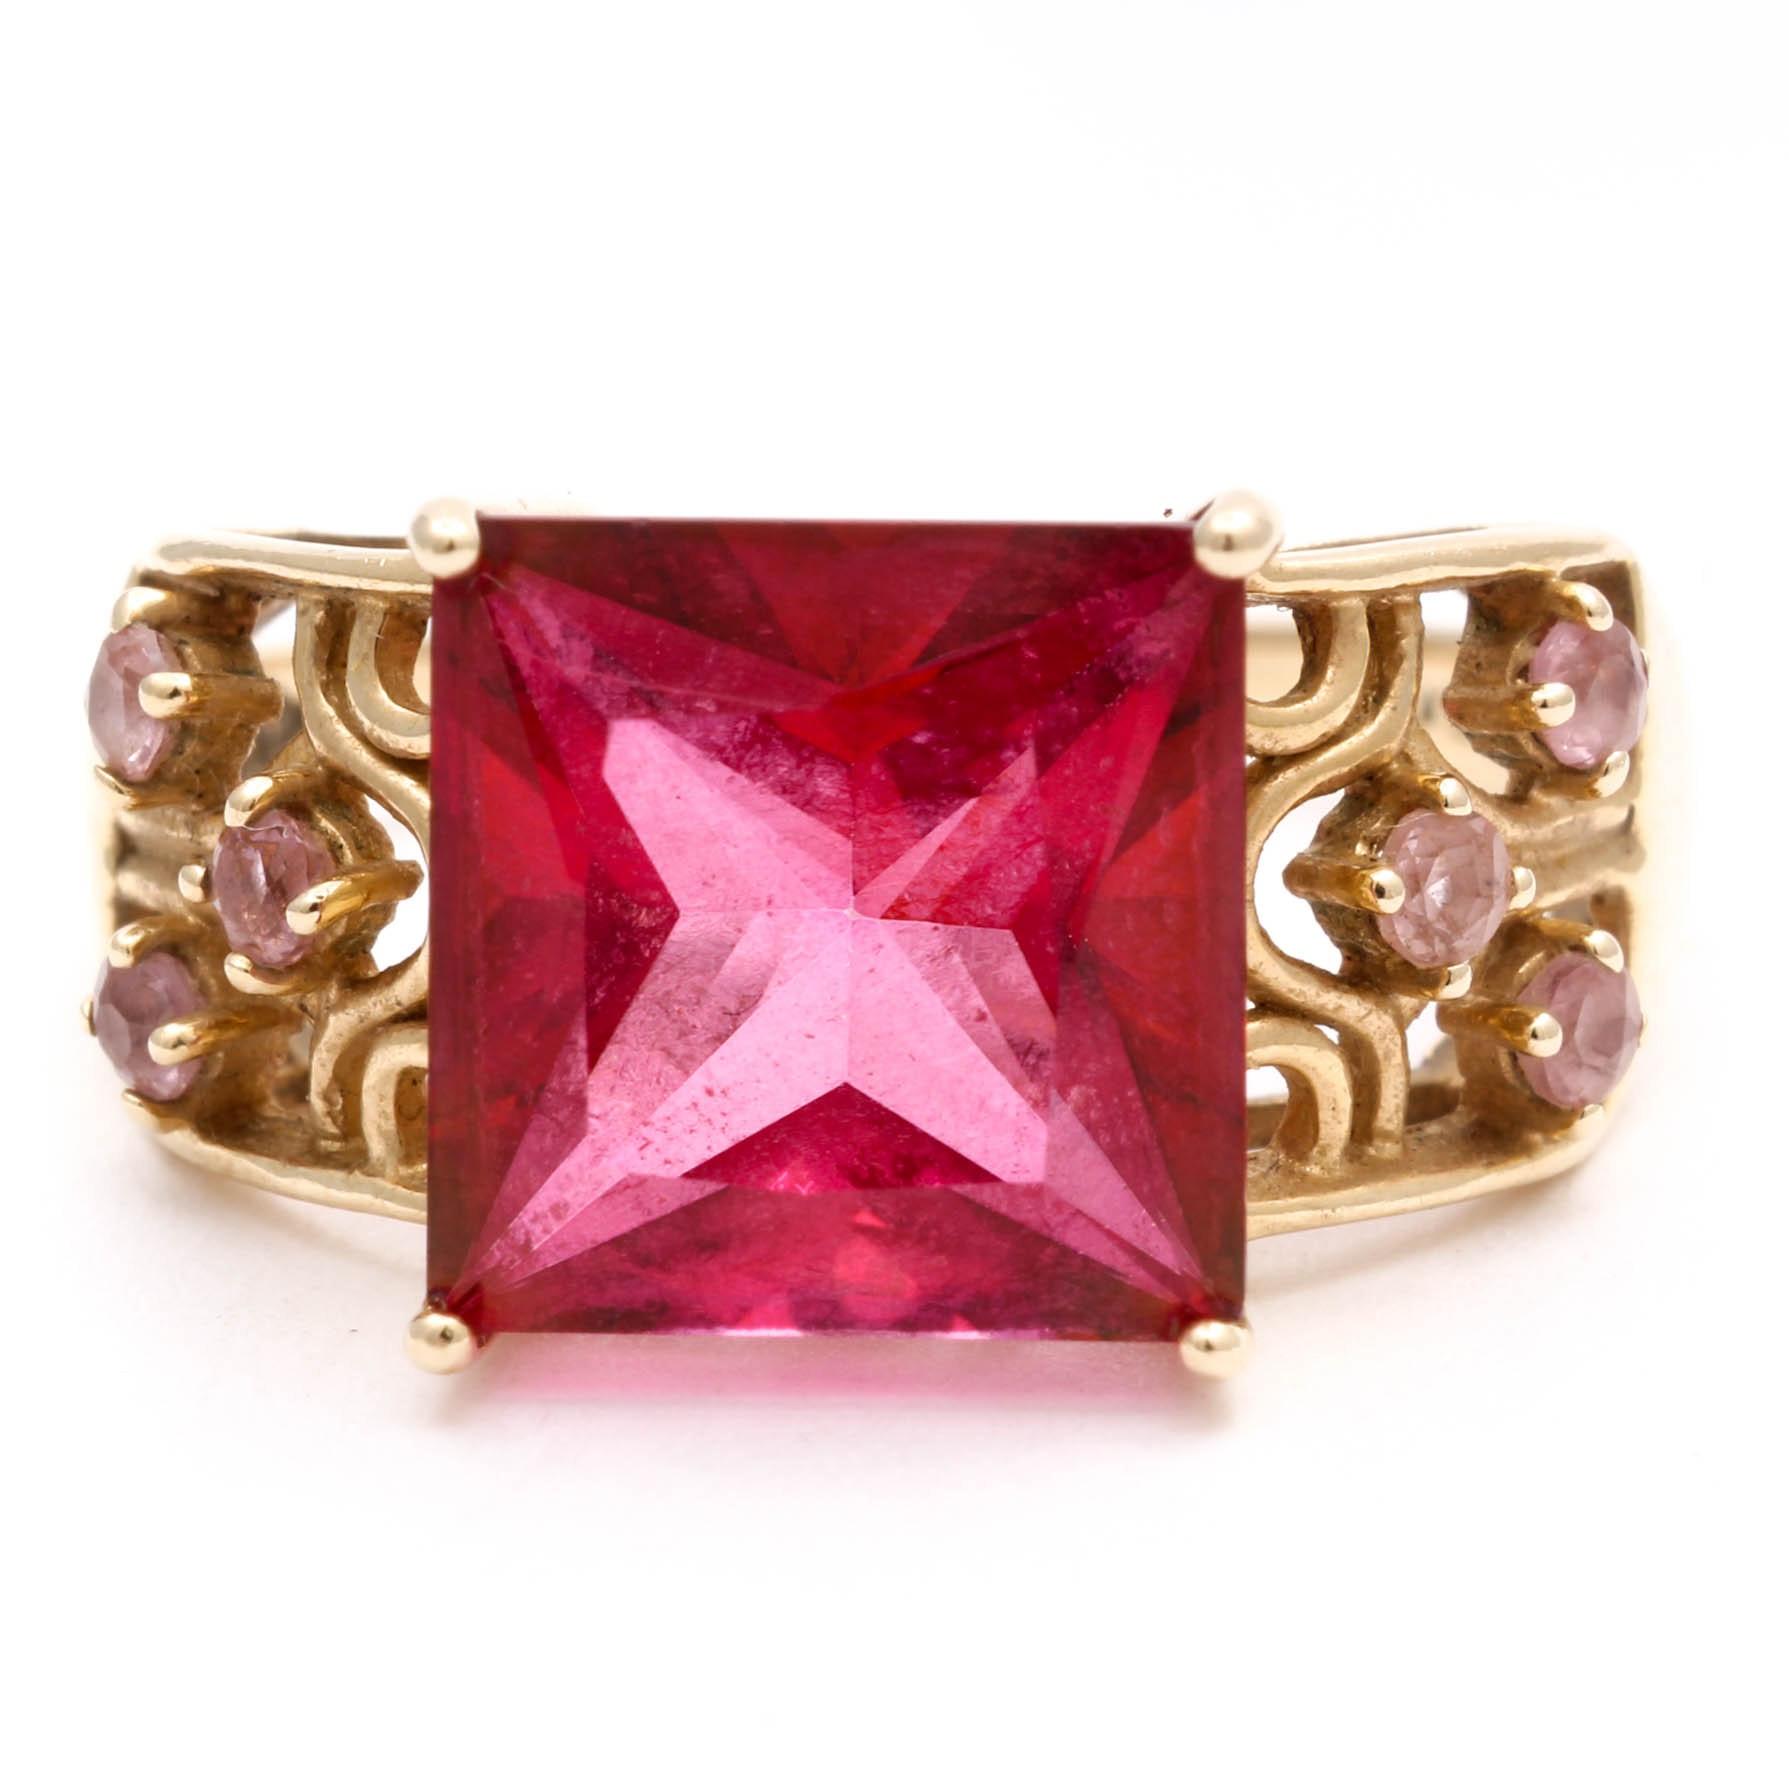 10K Yellow Gold Imitation Gemstone and Quartz Ring